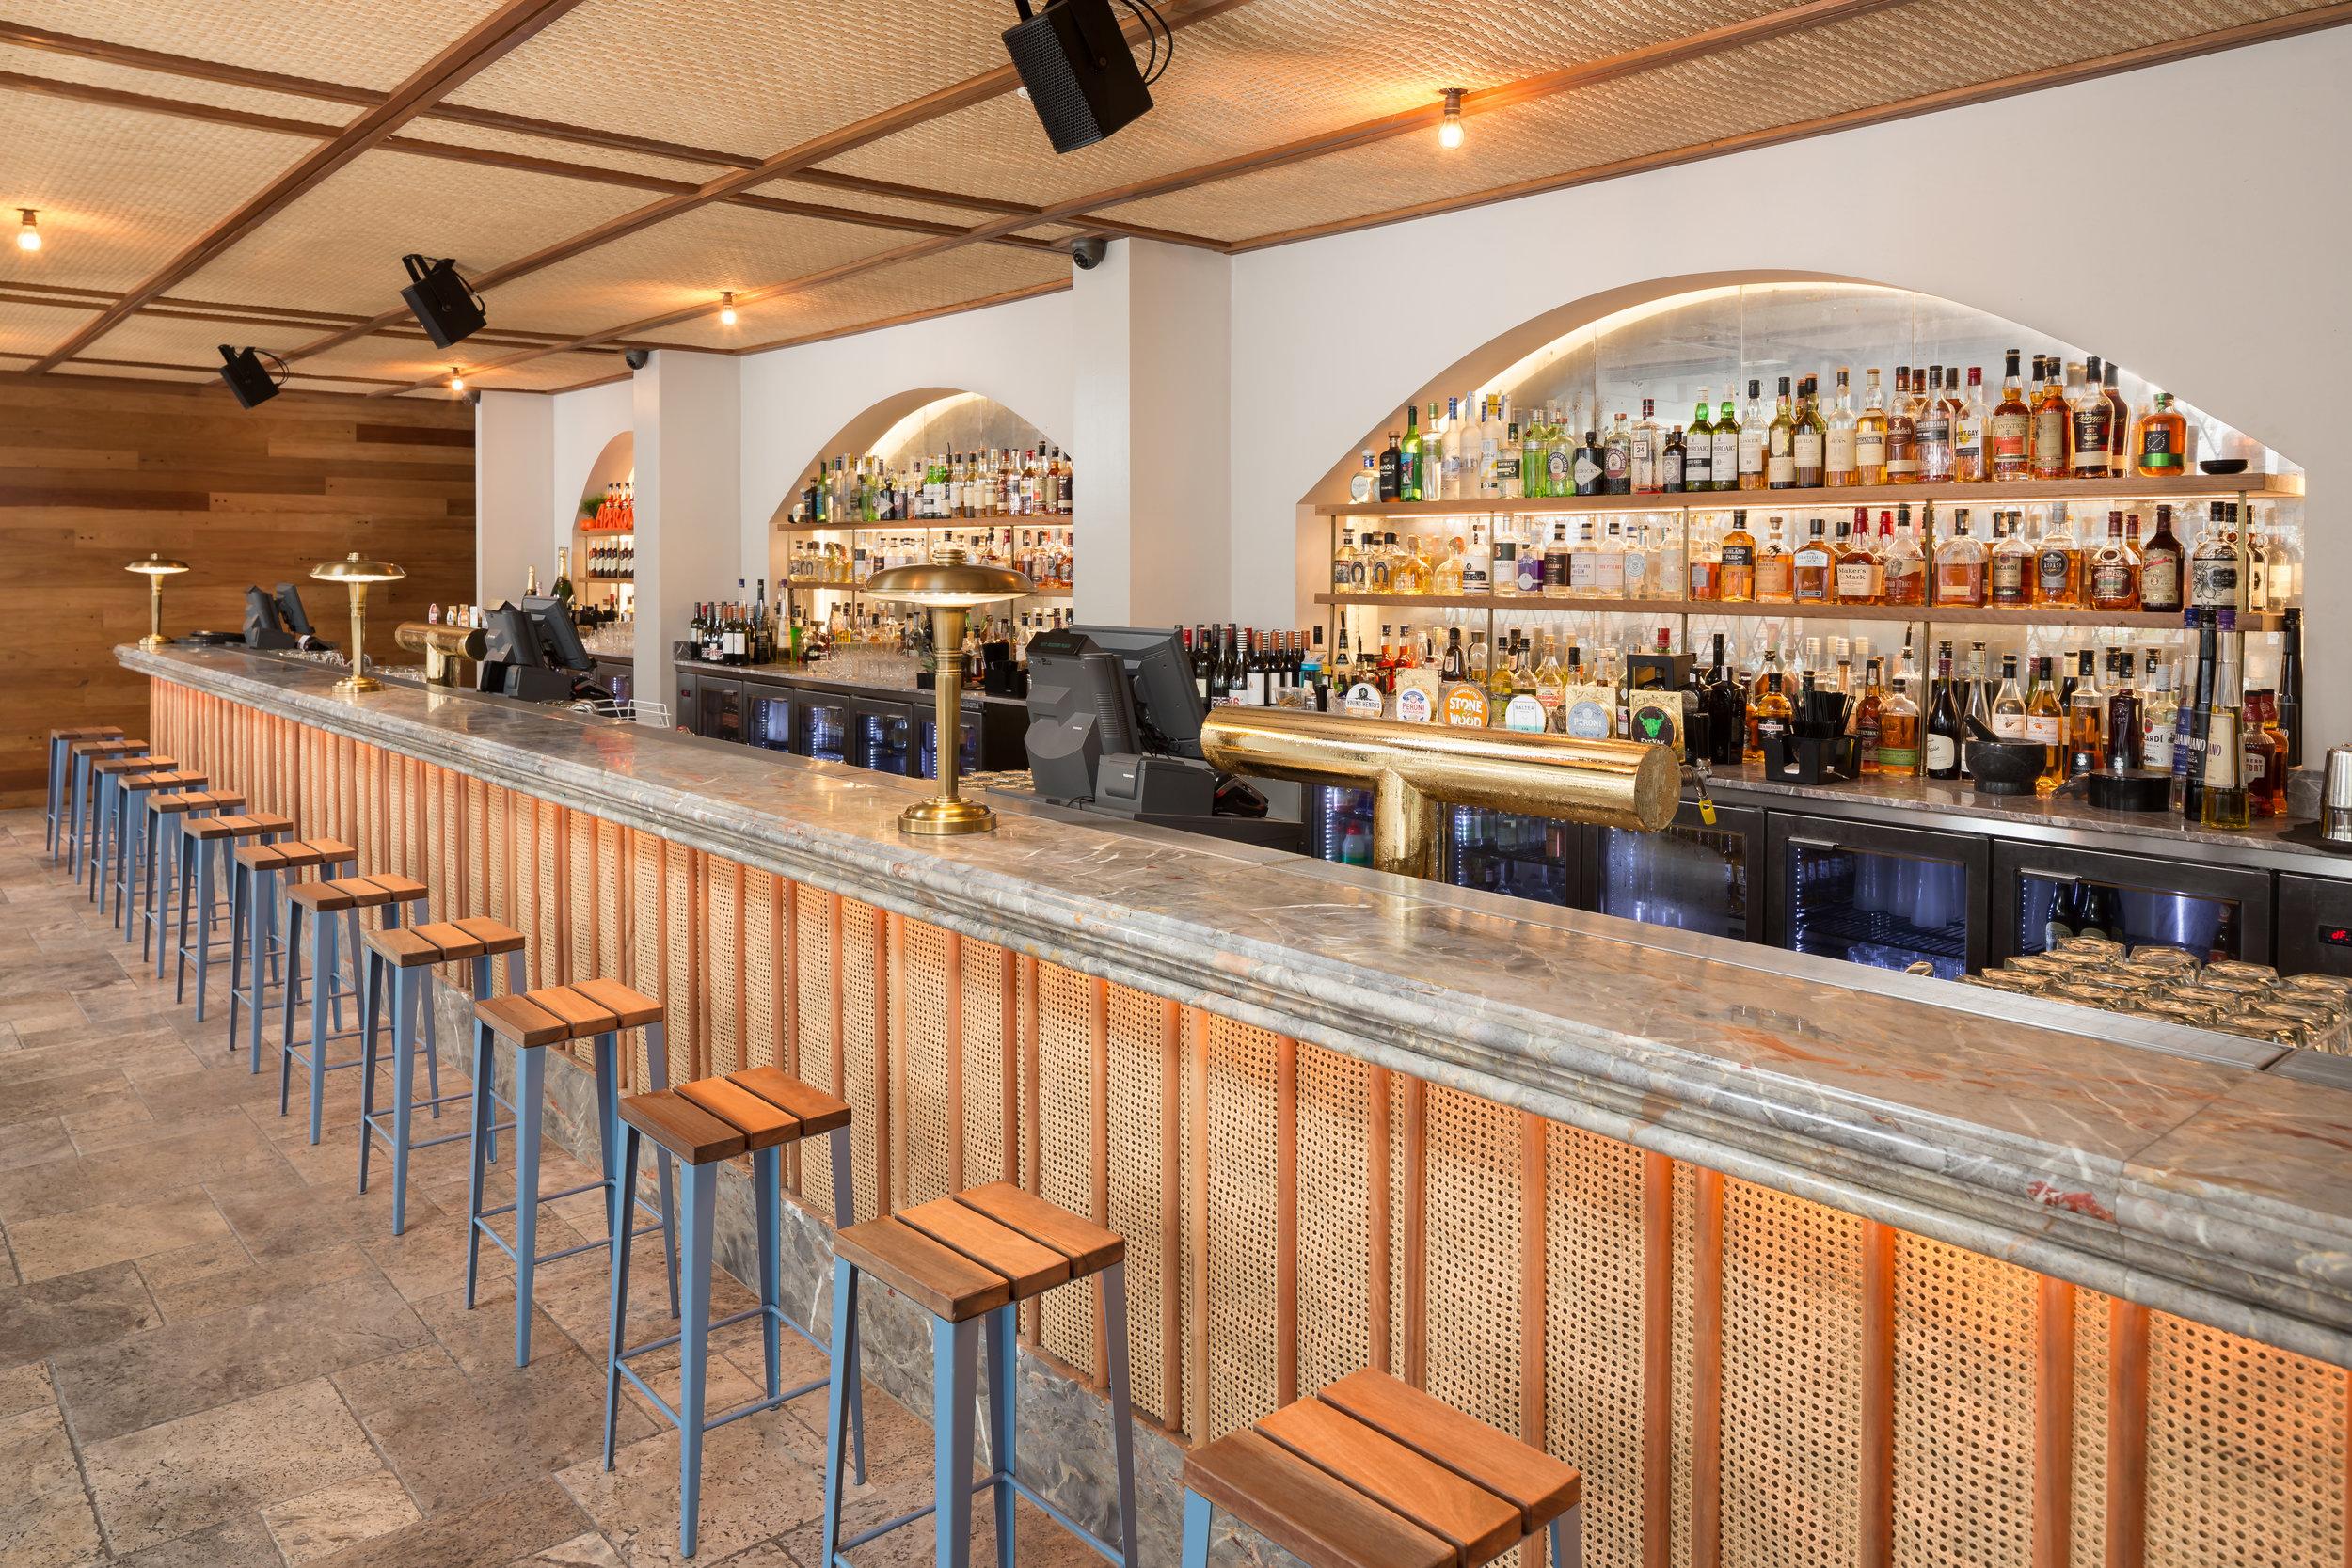 The Island_Rooftop Bar